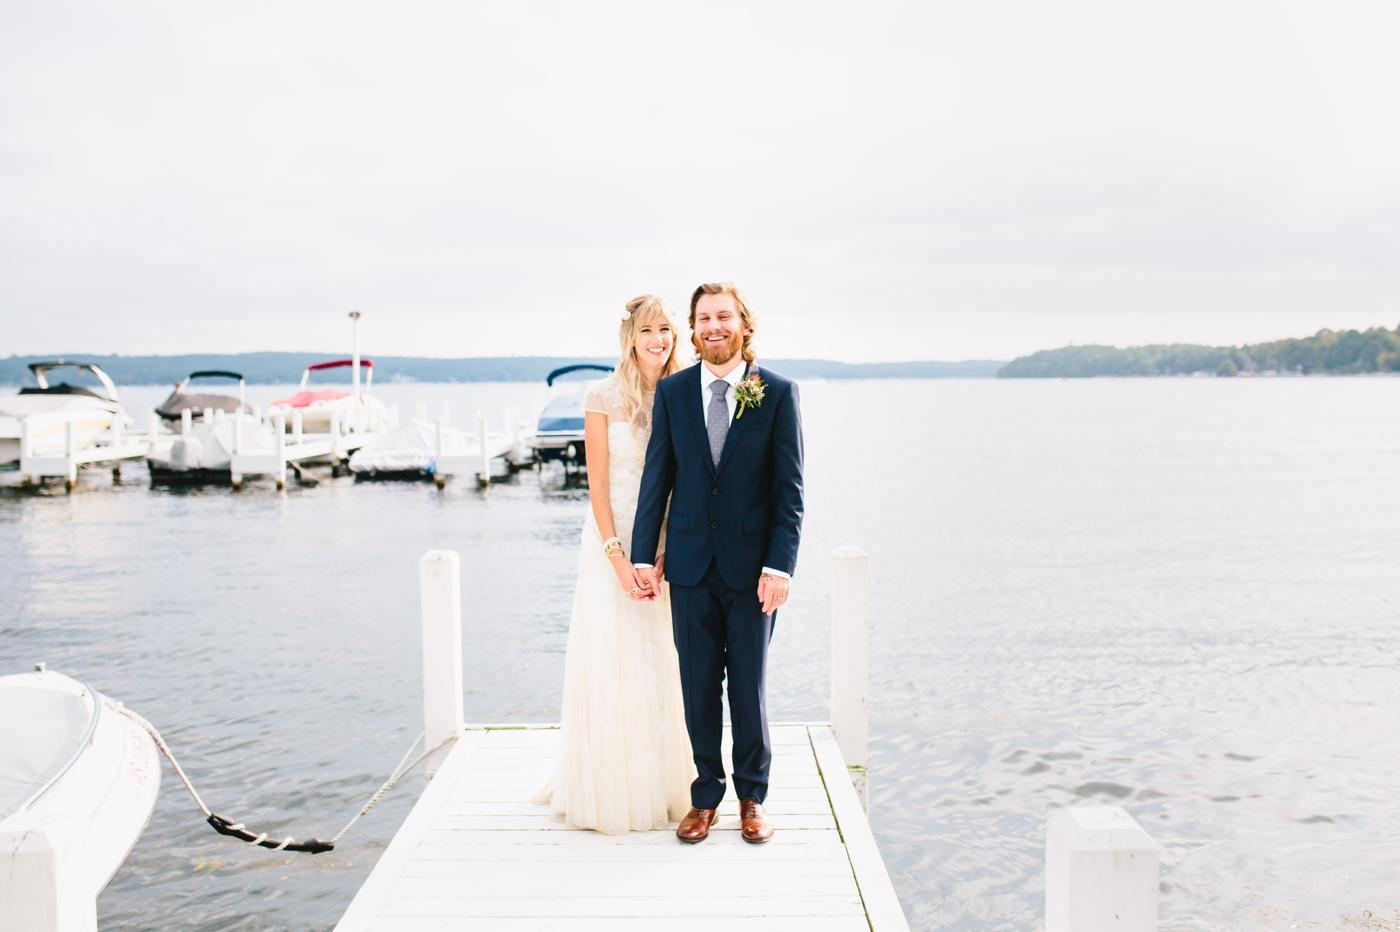 chicago-fine-art-wedding-photography-chriskelsey27